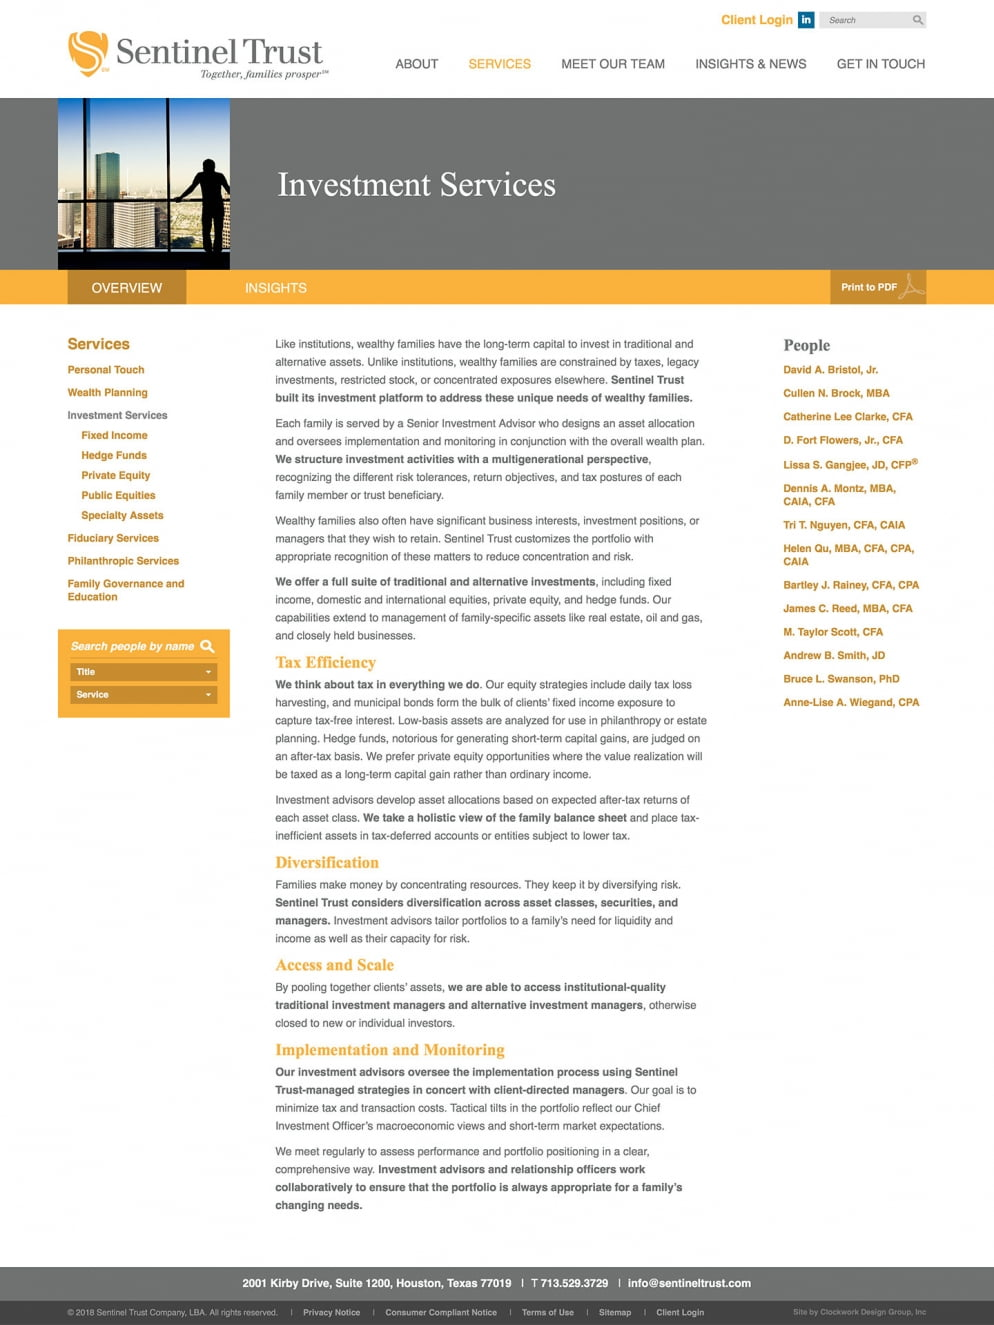 Sentinel Trust Service